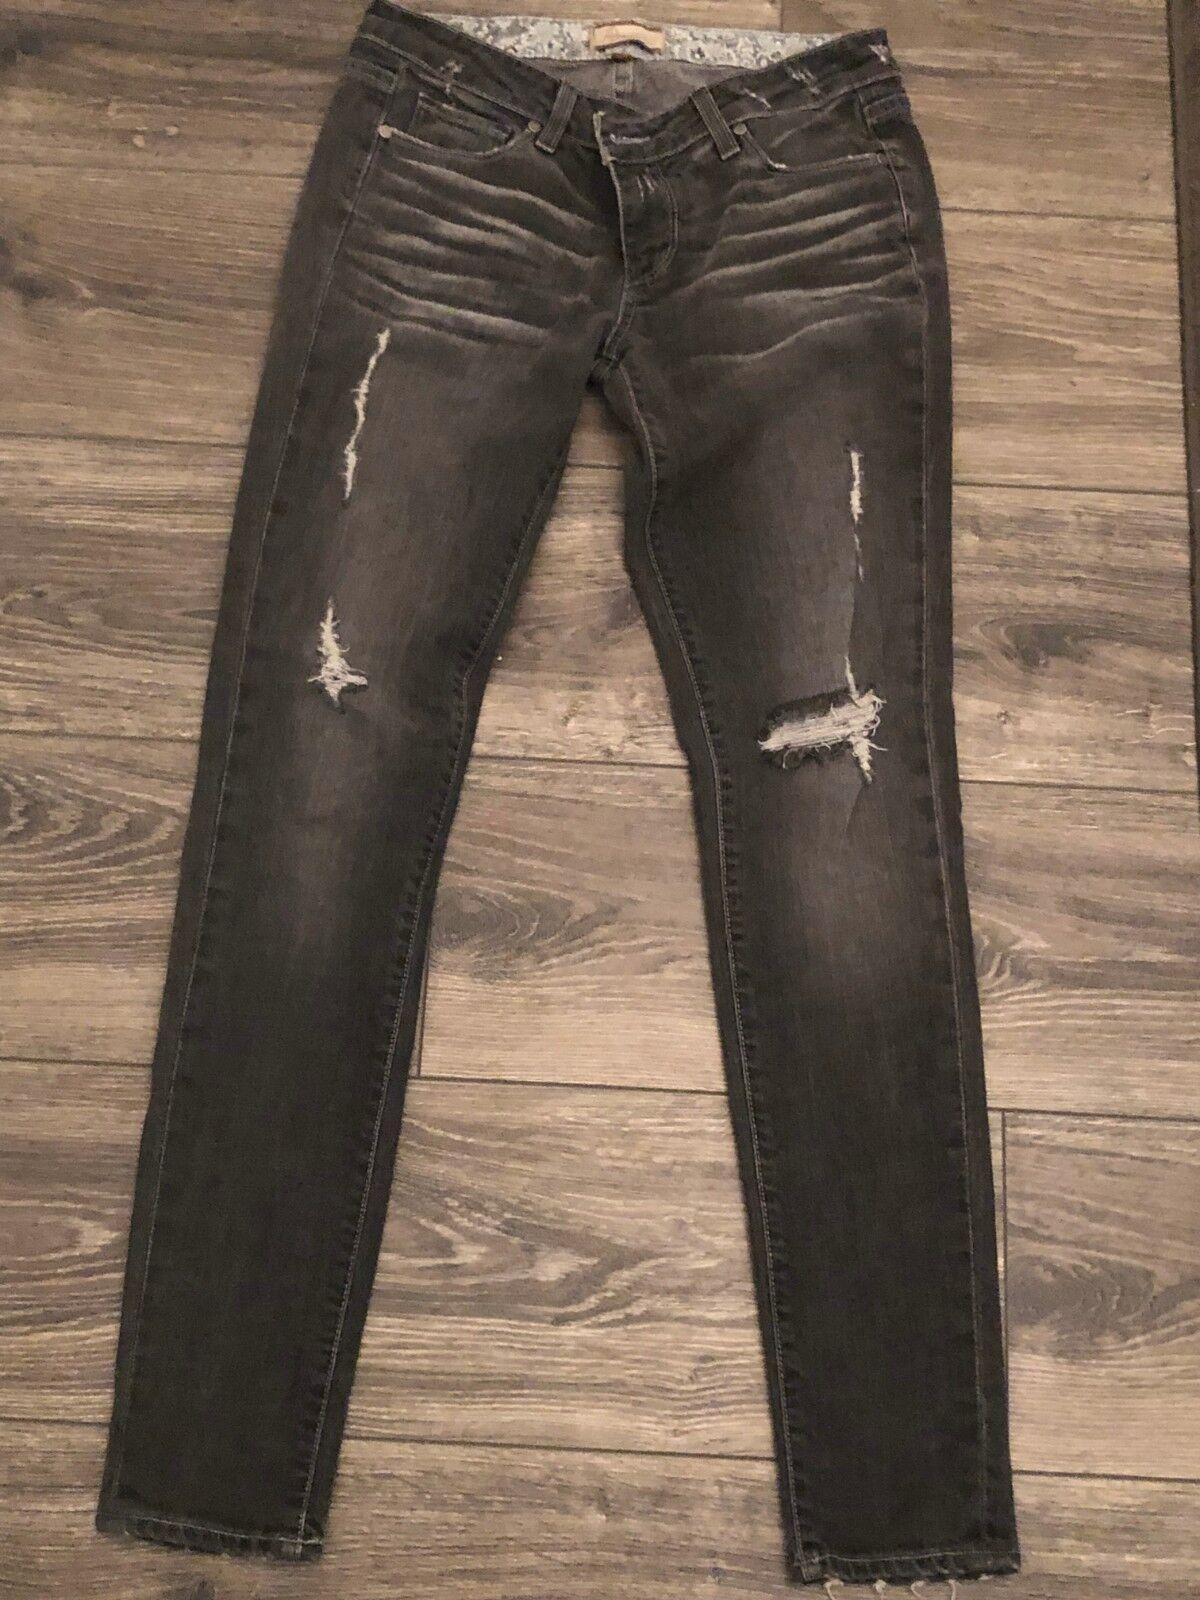 Paige premium denim distressed skinny jeans size 28 dark grey